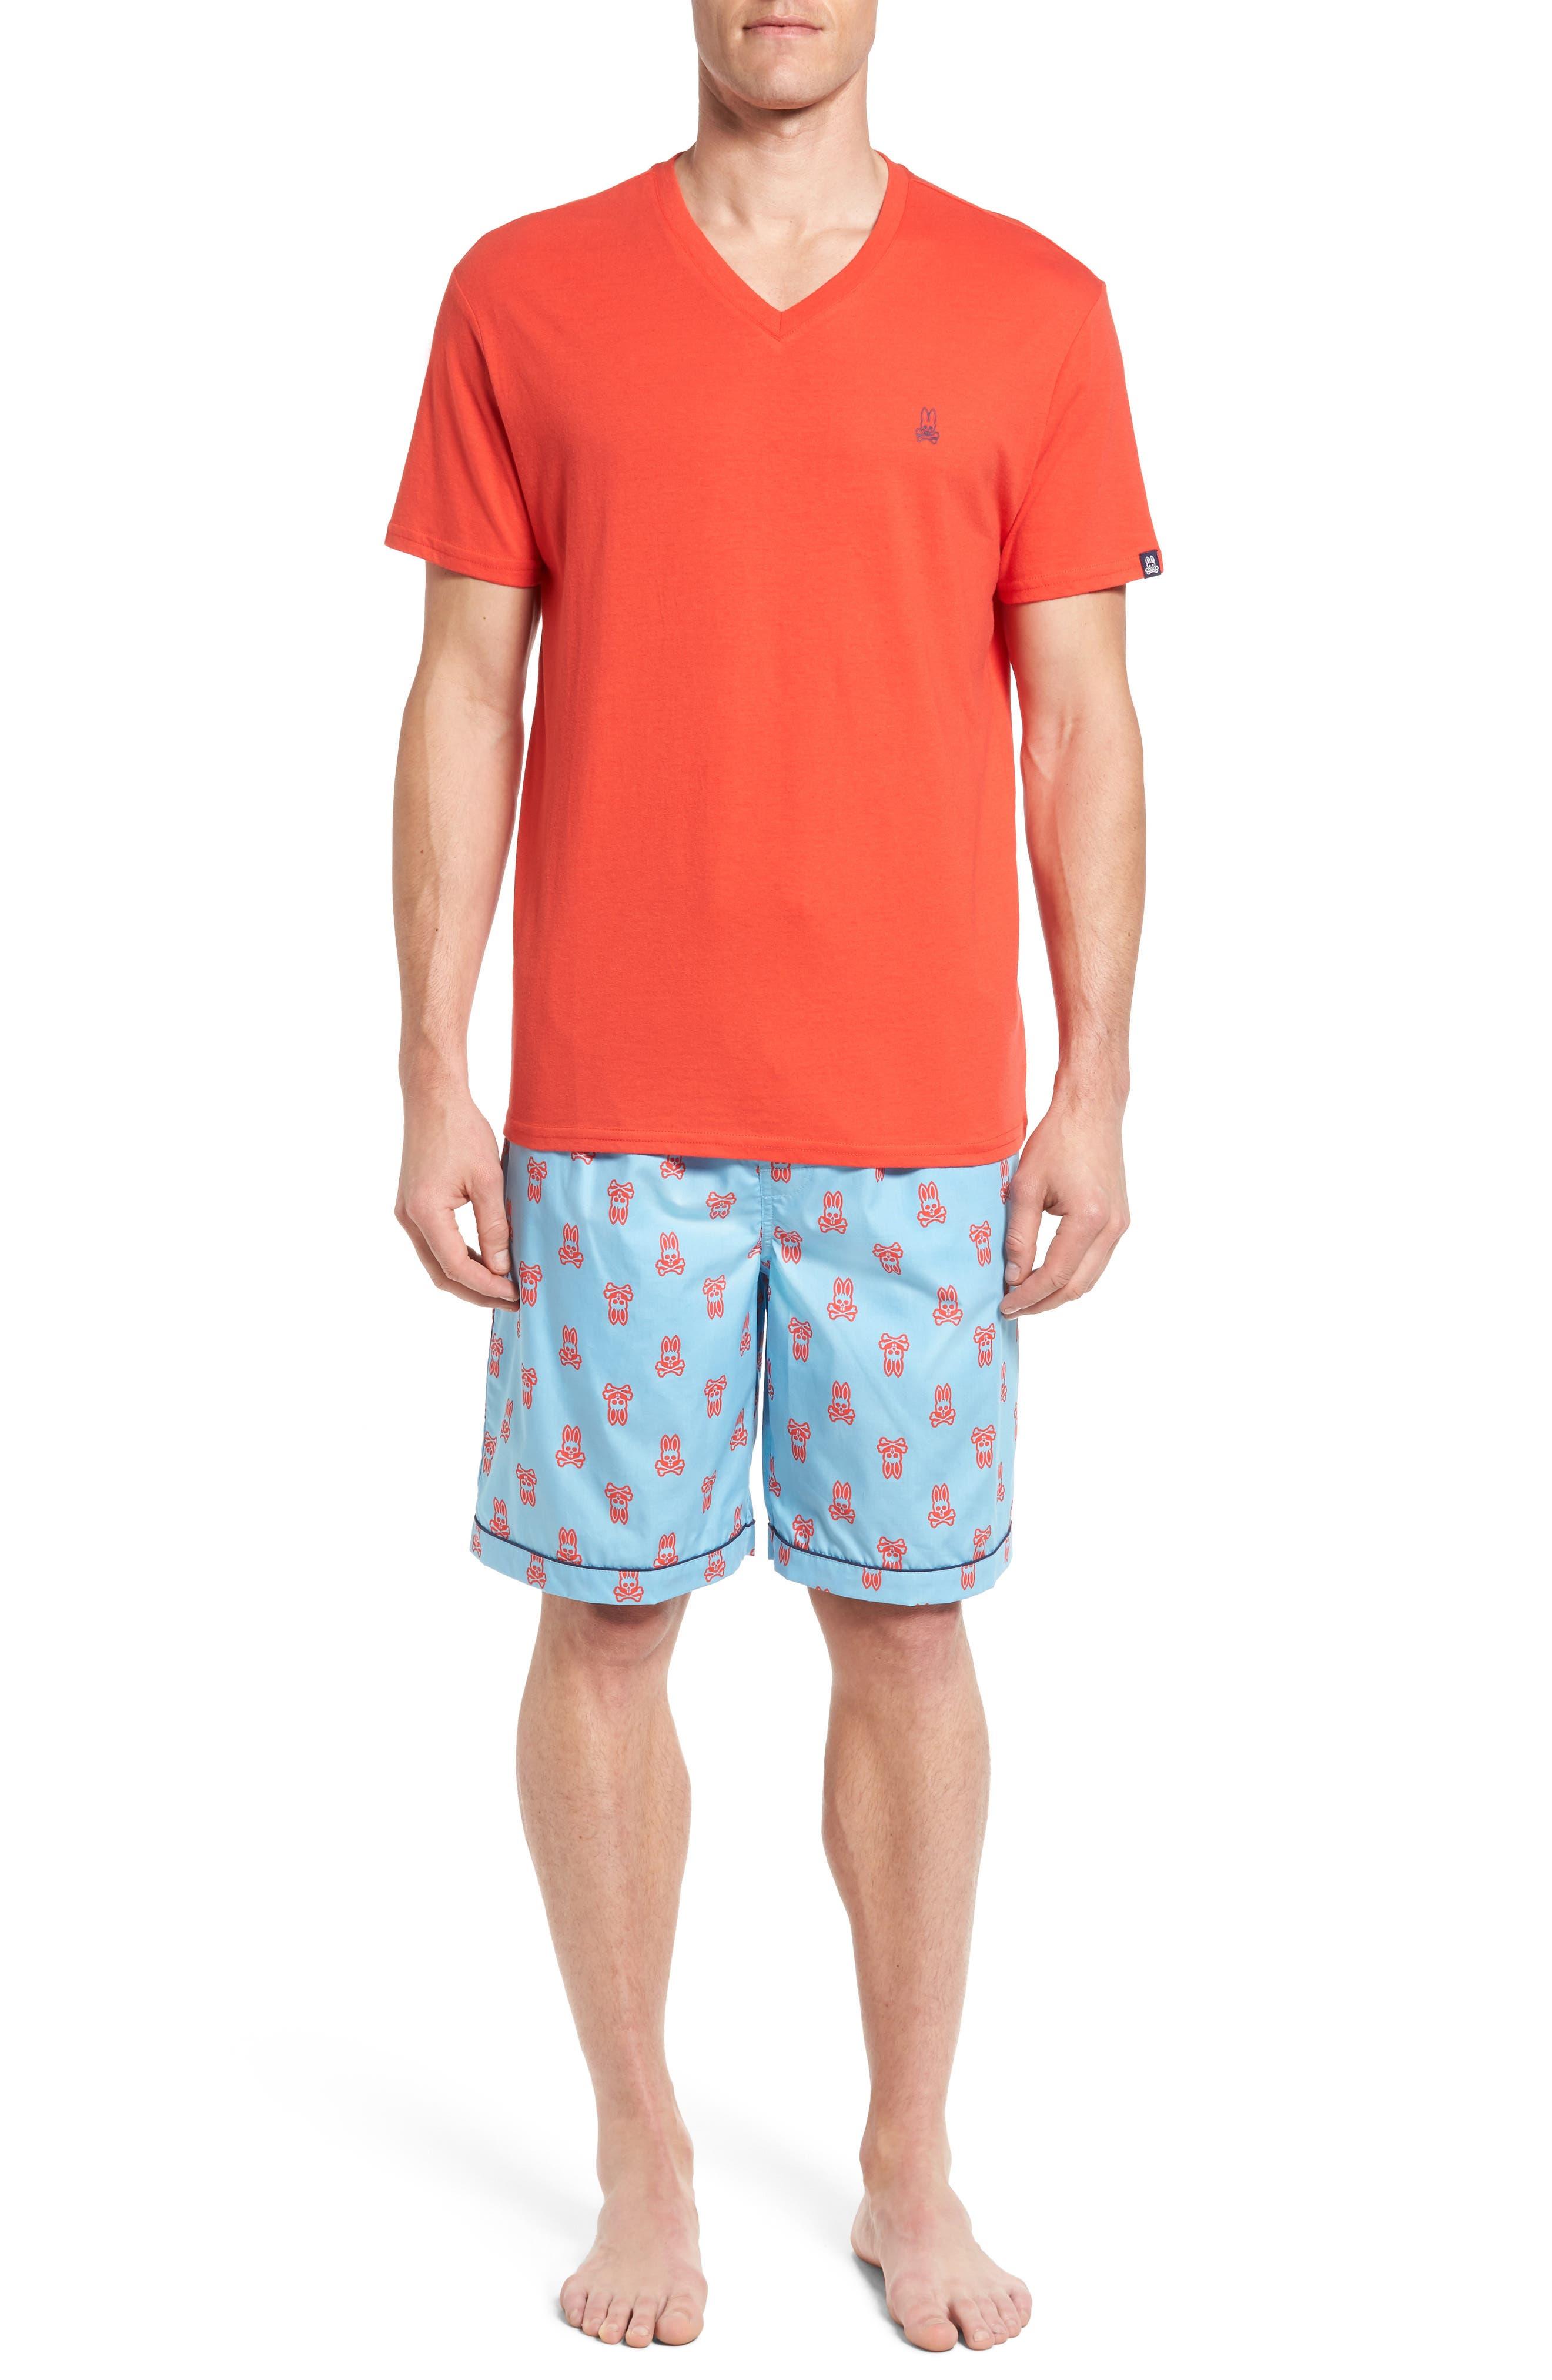 Pajama Set,                             Main thumbnail 1, color,                             Brilliant Red/ Whipple Bunny